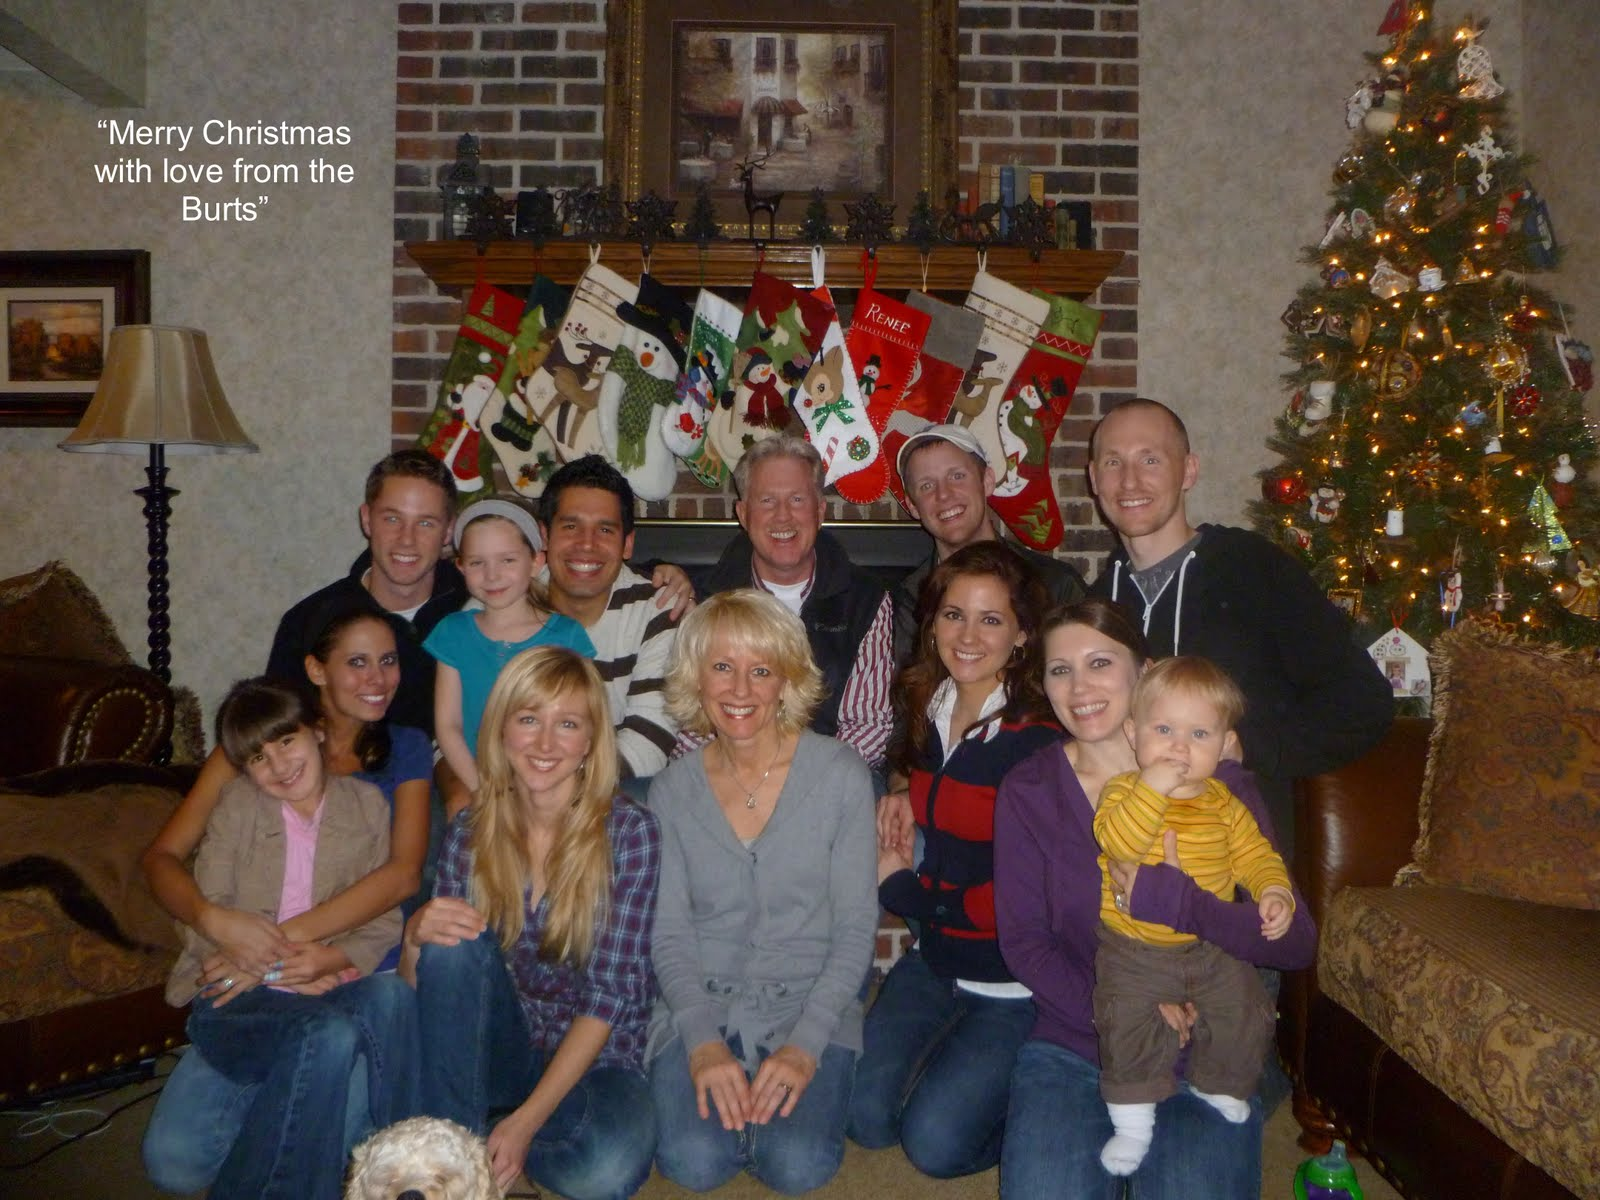 Merry Christmas From Pastor Tim Burt Inspirational